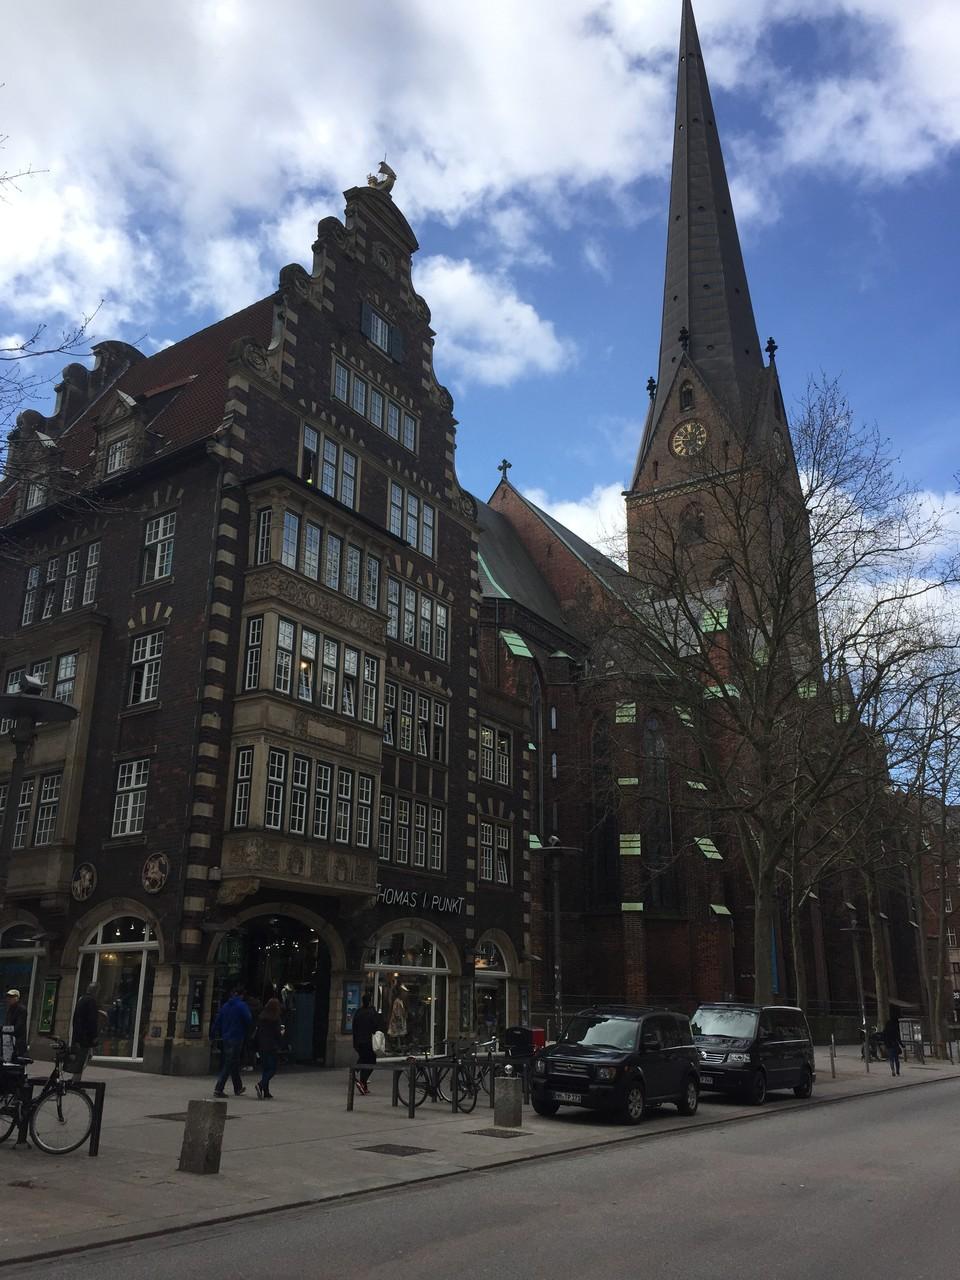 Mönckebergstraße - Thomas-i-Punkt im Hulbe Haus und Hauptkirche Sankt Petri